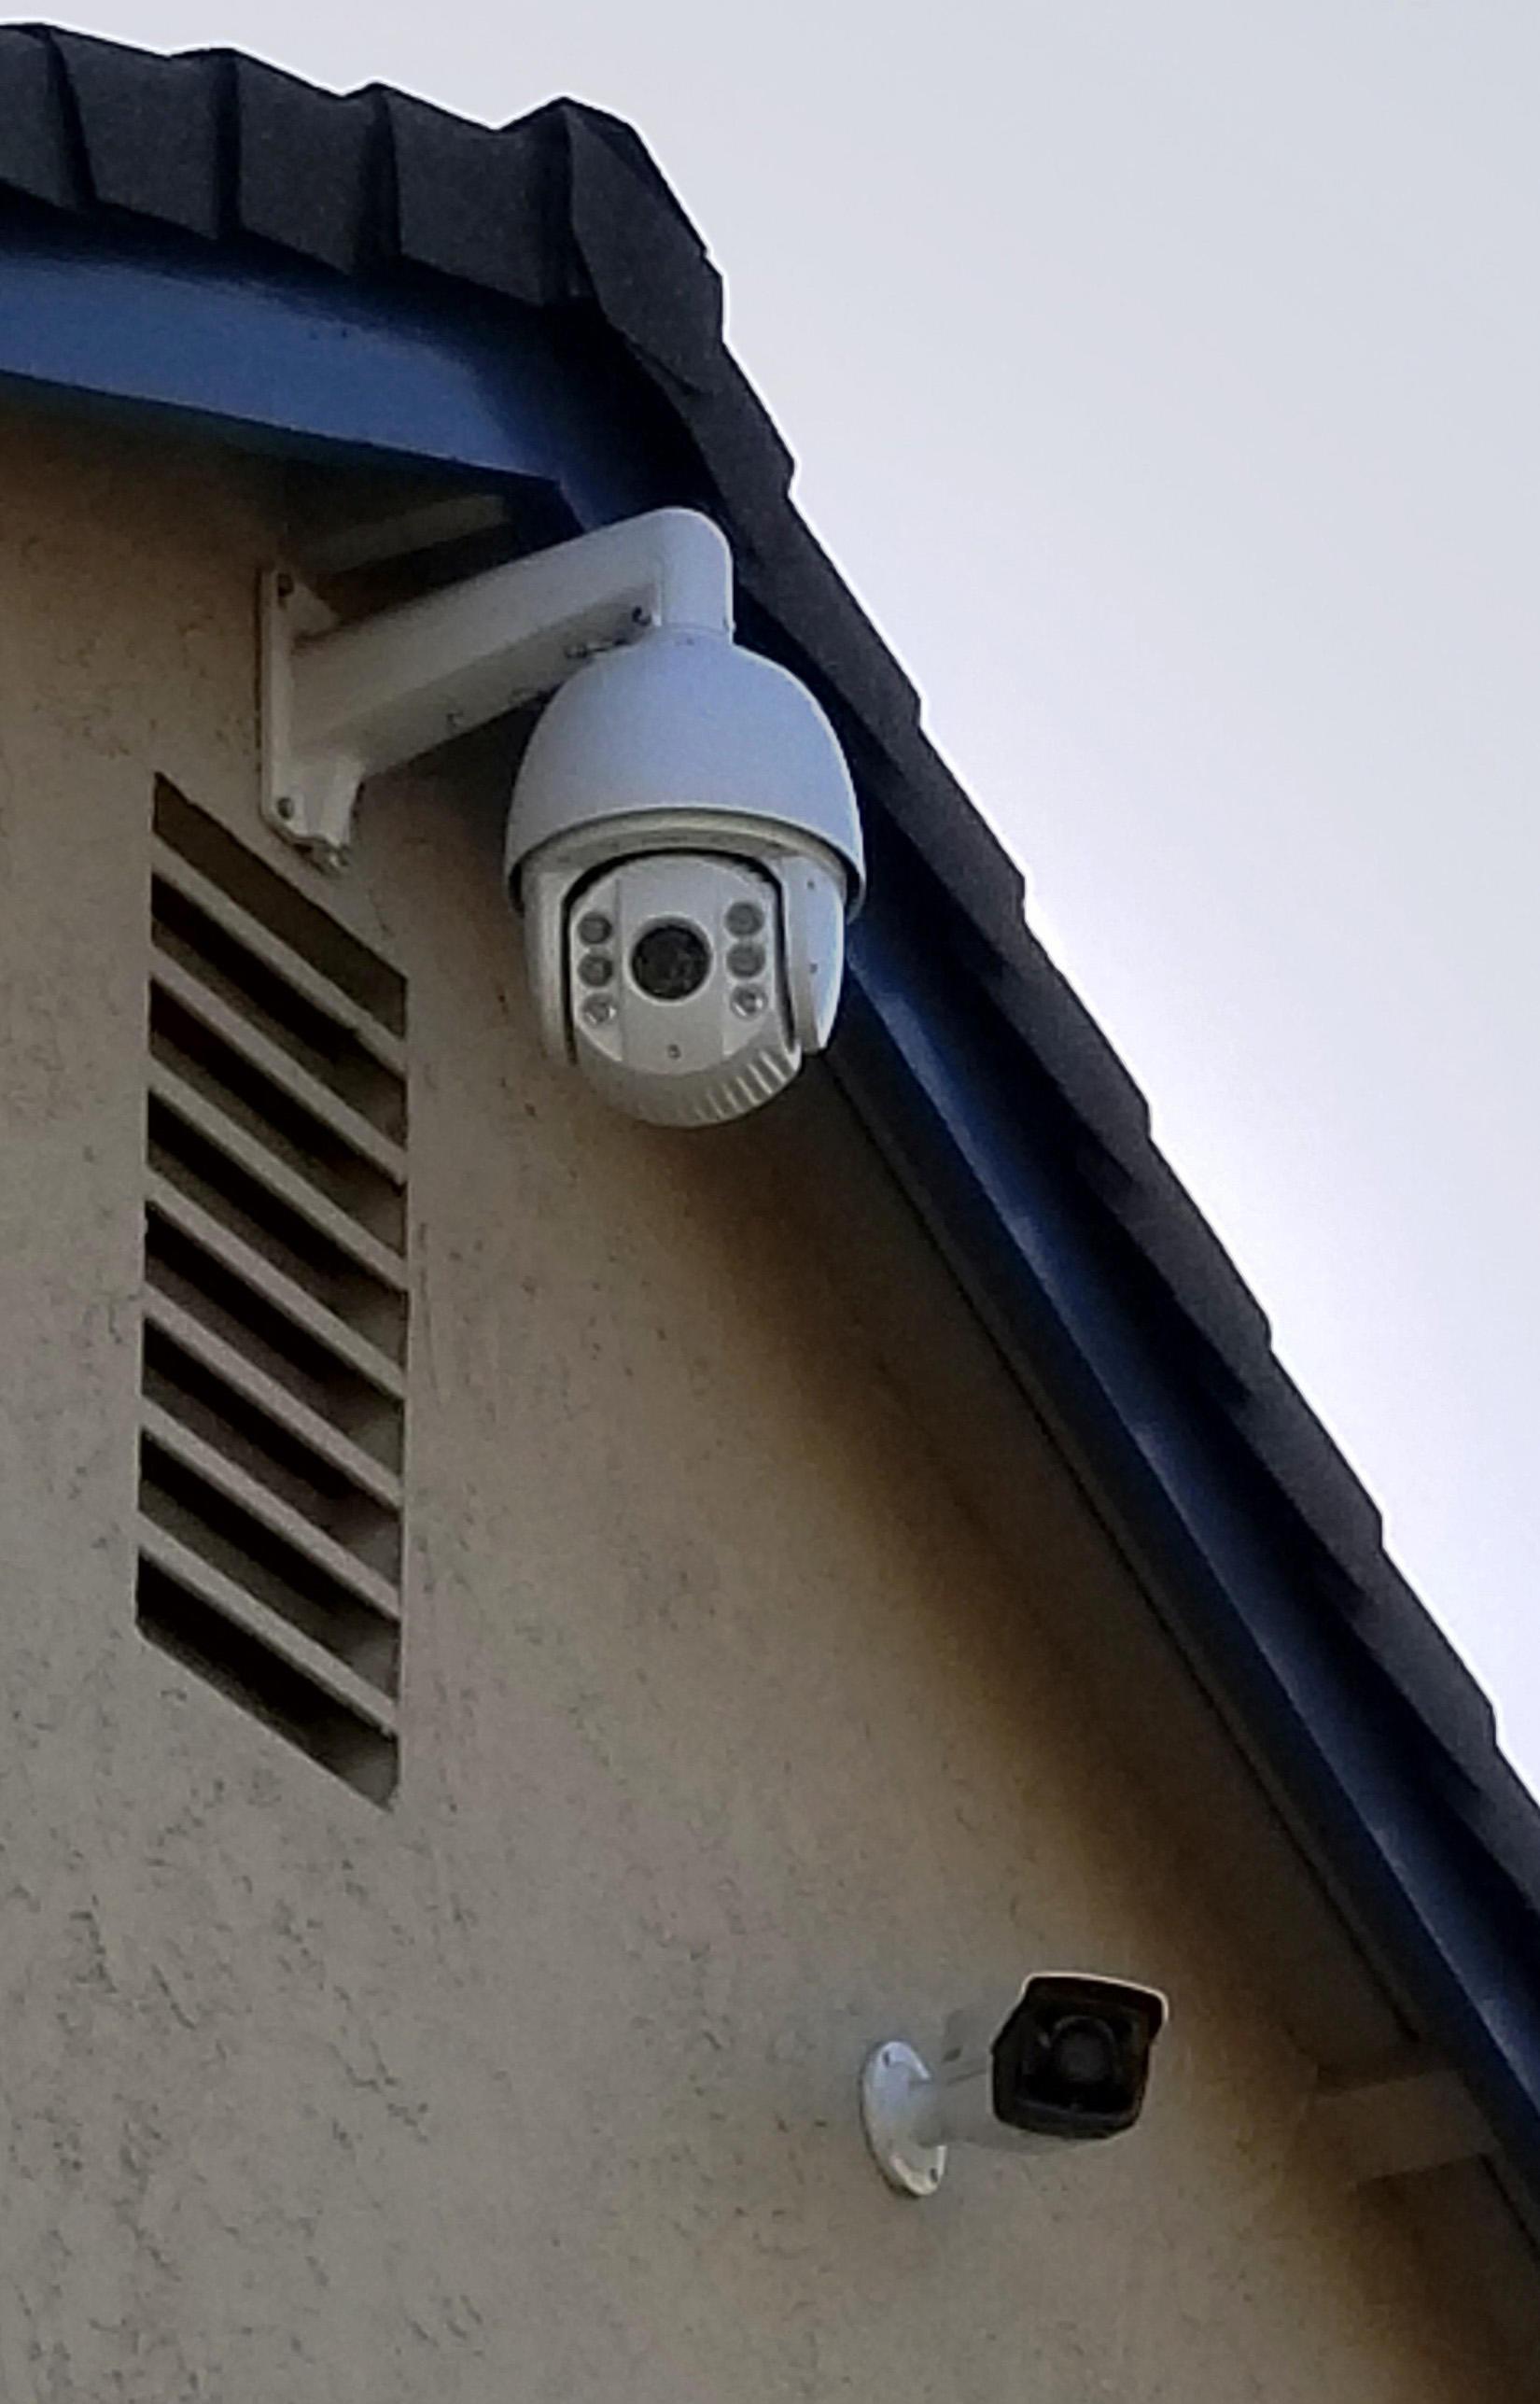 CCTV Security Camera Installer and Video Surveillance